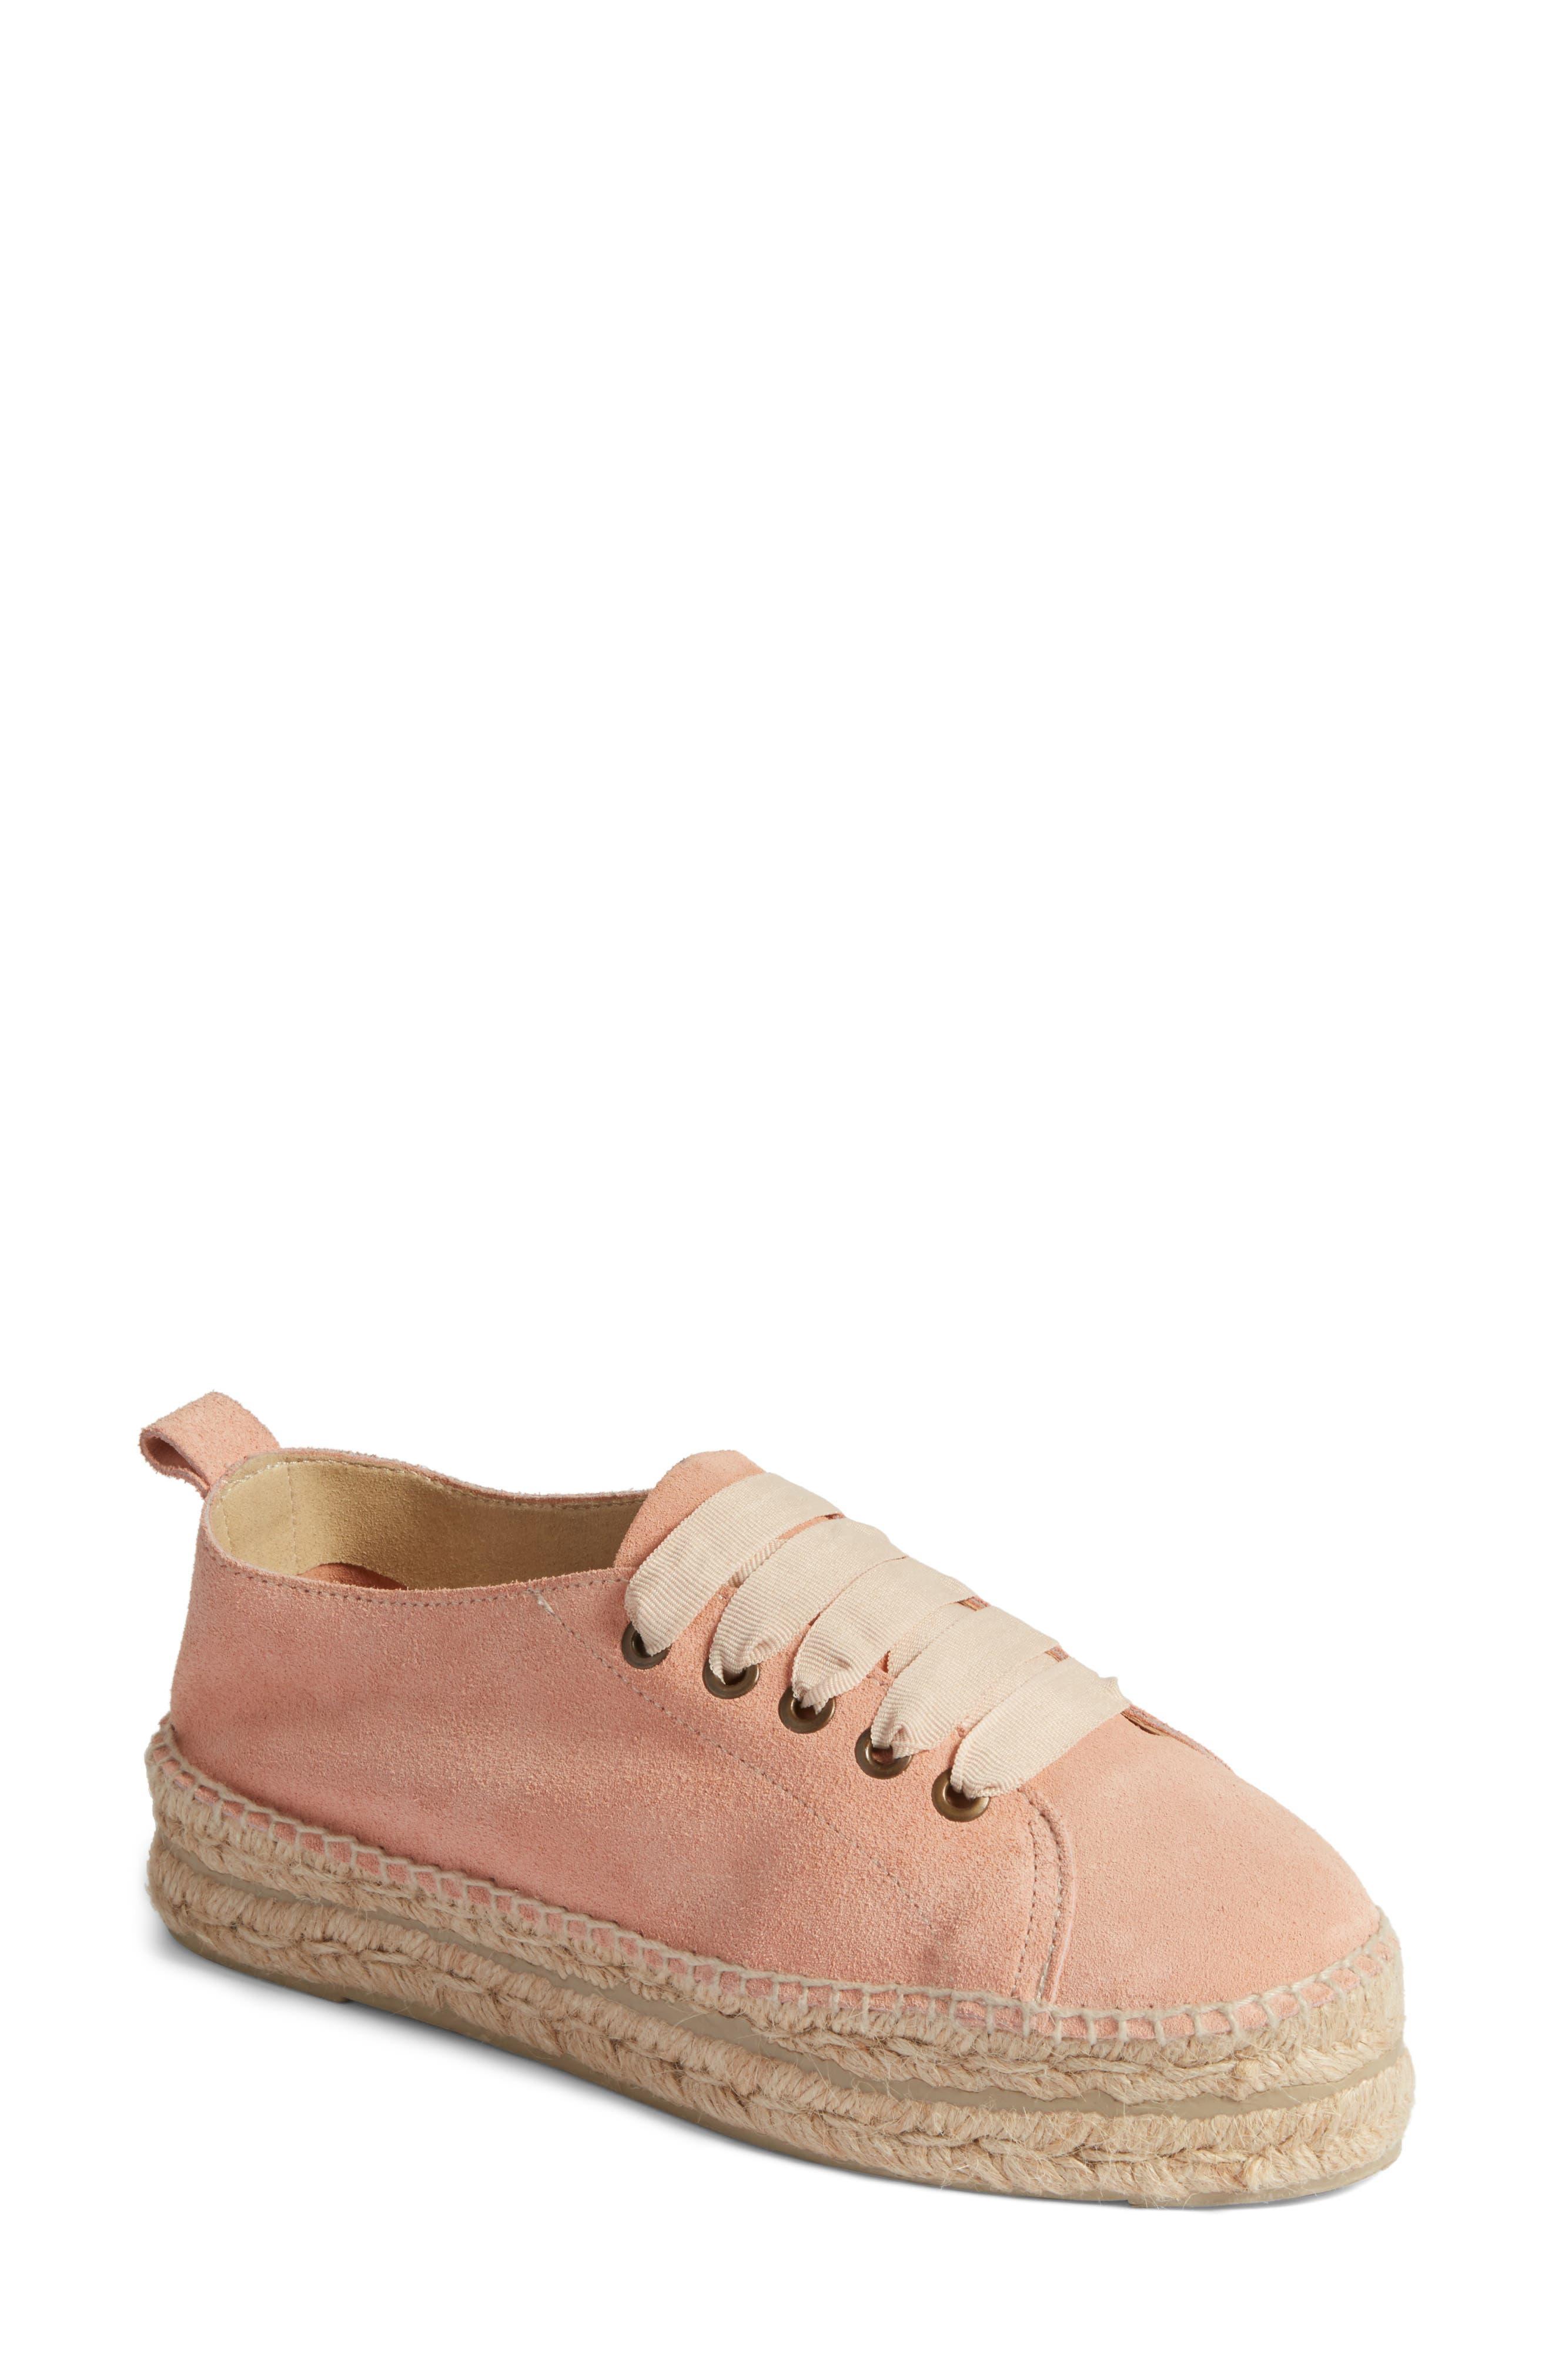 MANEBÍ Hamptons Espadrille Sneaker (Women)